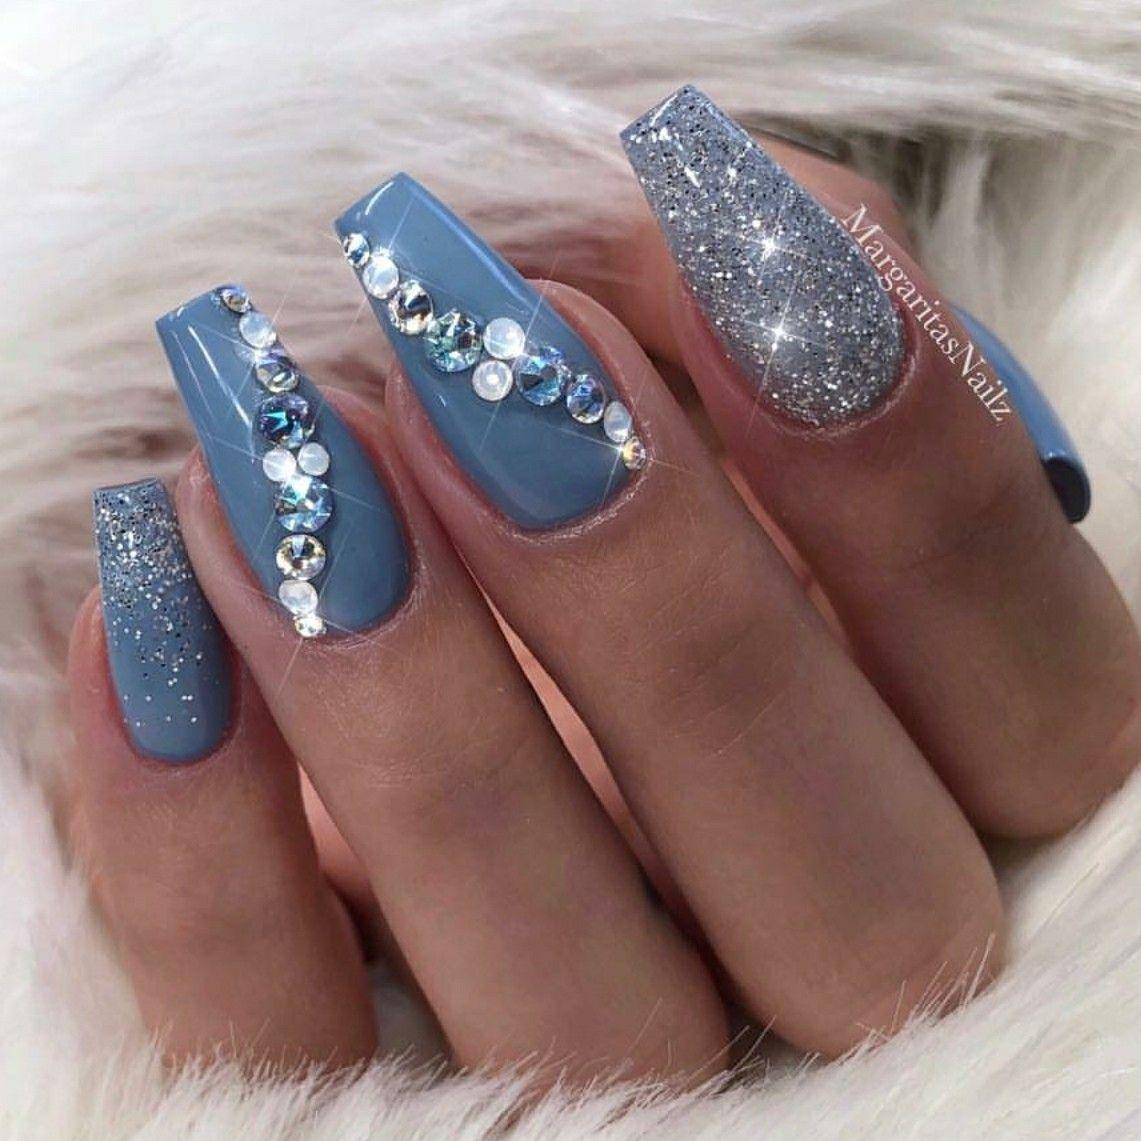 Glitter Nails Nails With Rhinestones Ballerina Nails Blue Nails Acrylic Nails Blue Coffin Nails Rhinestone Nails Nails Design With Rhinestones